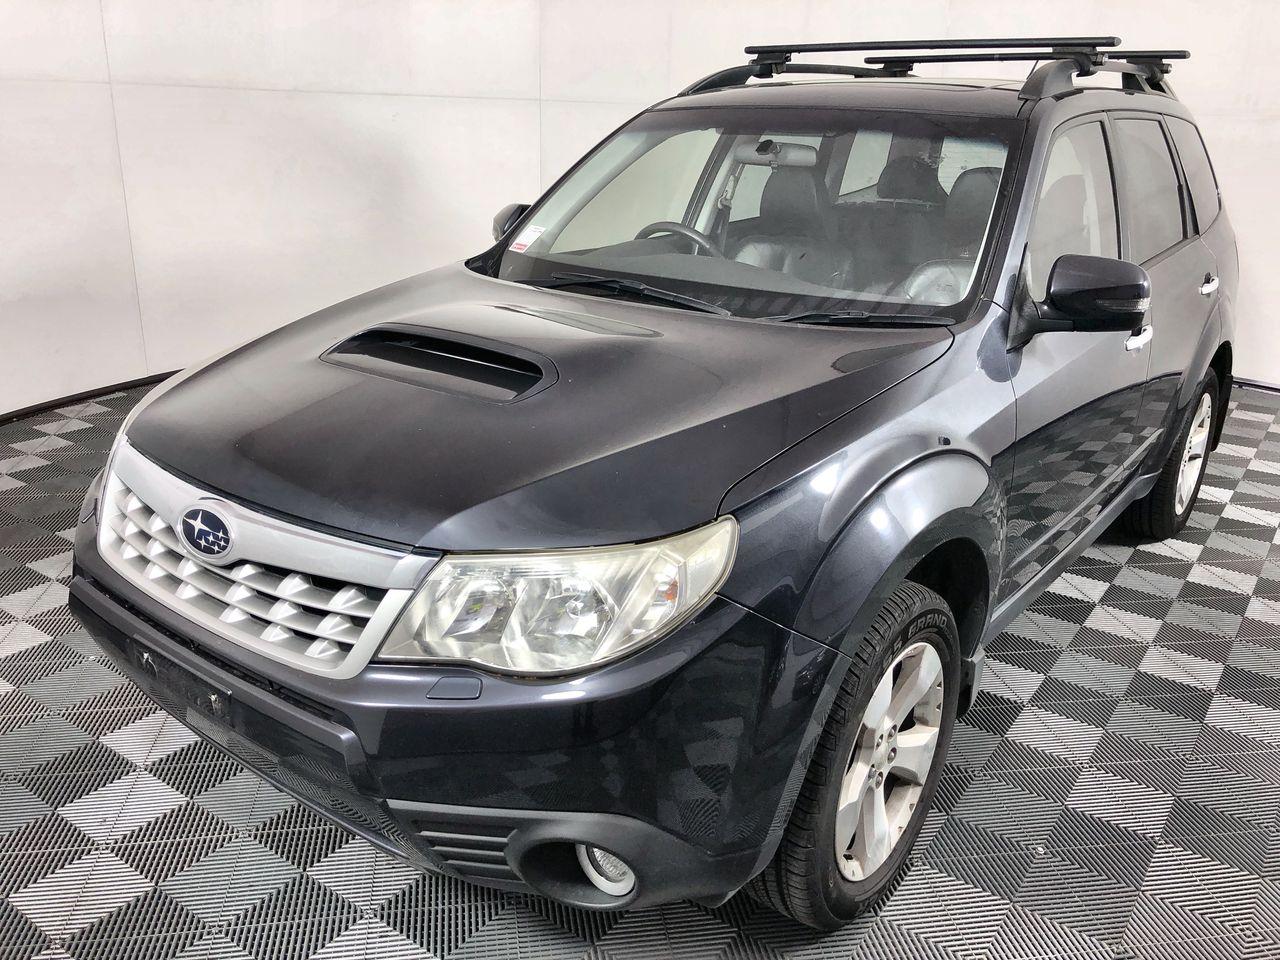 2012 Subaru Forester 2.0D Premium Turbo Diesel Wagon